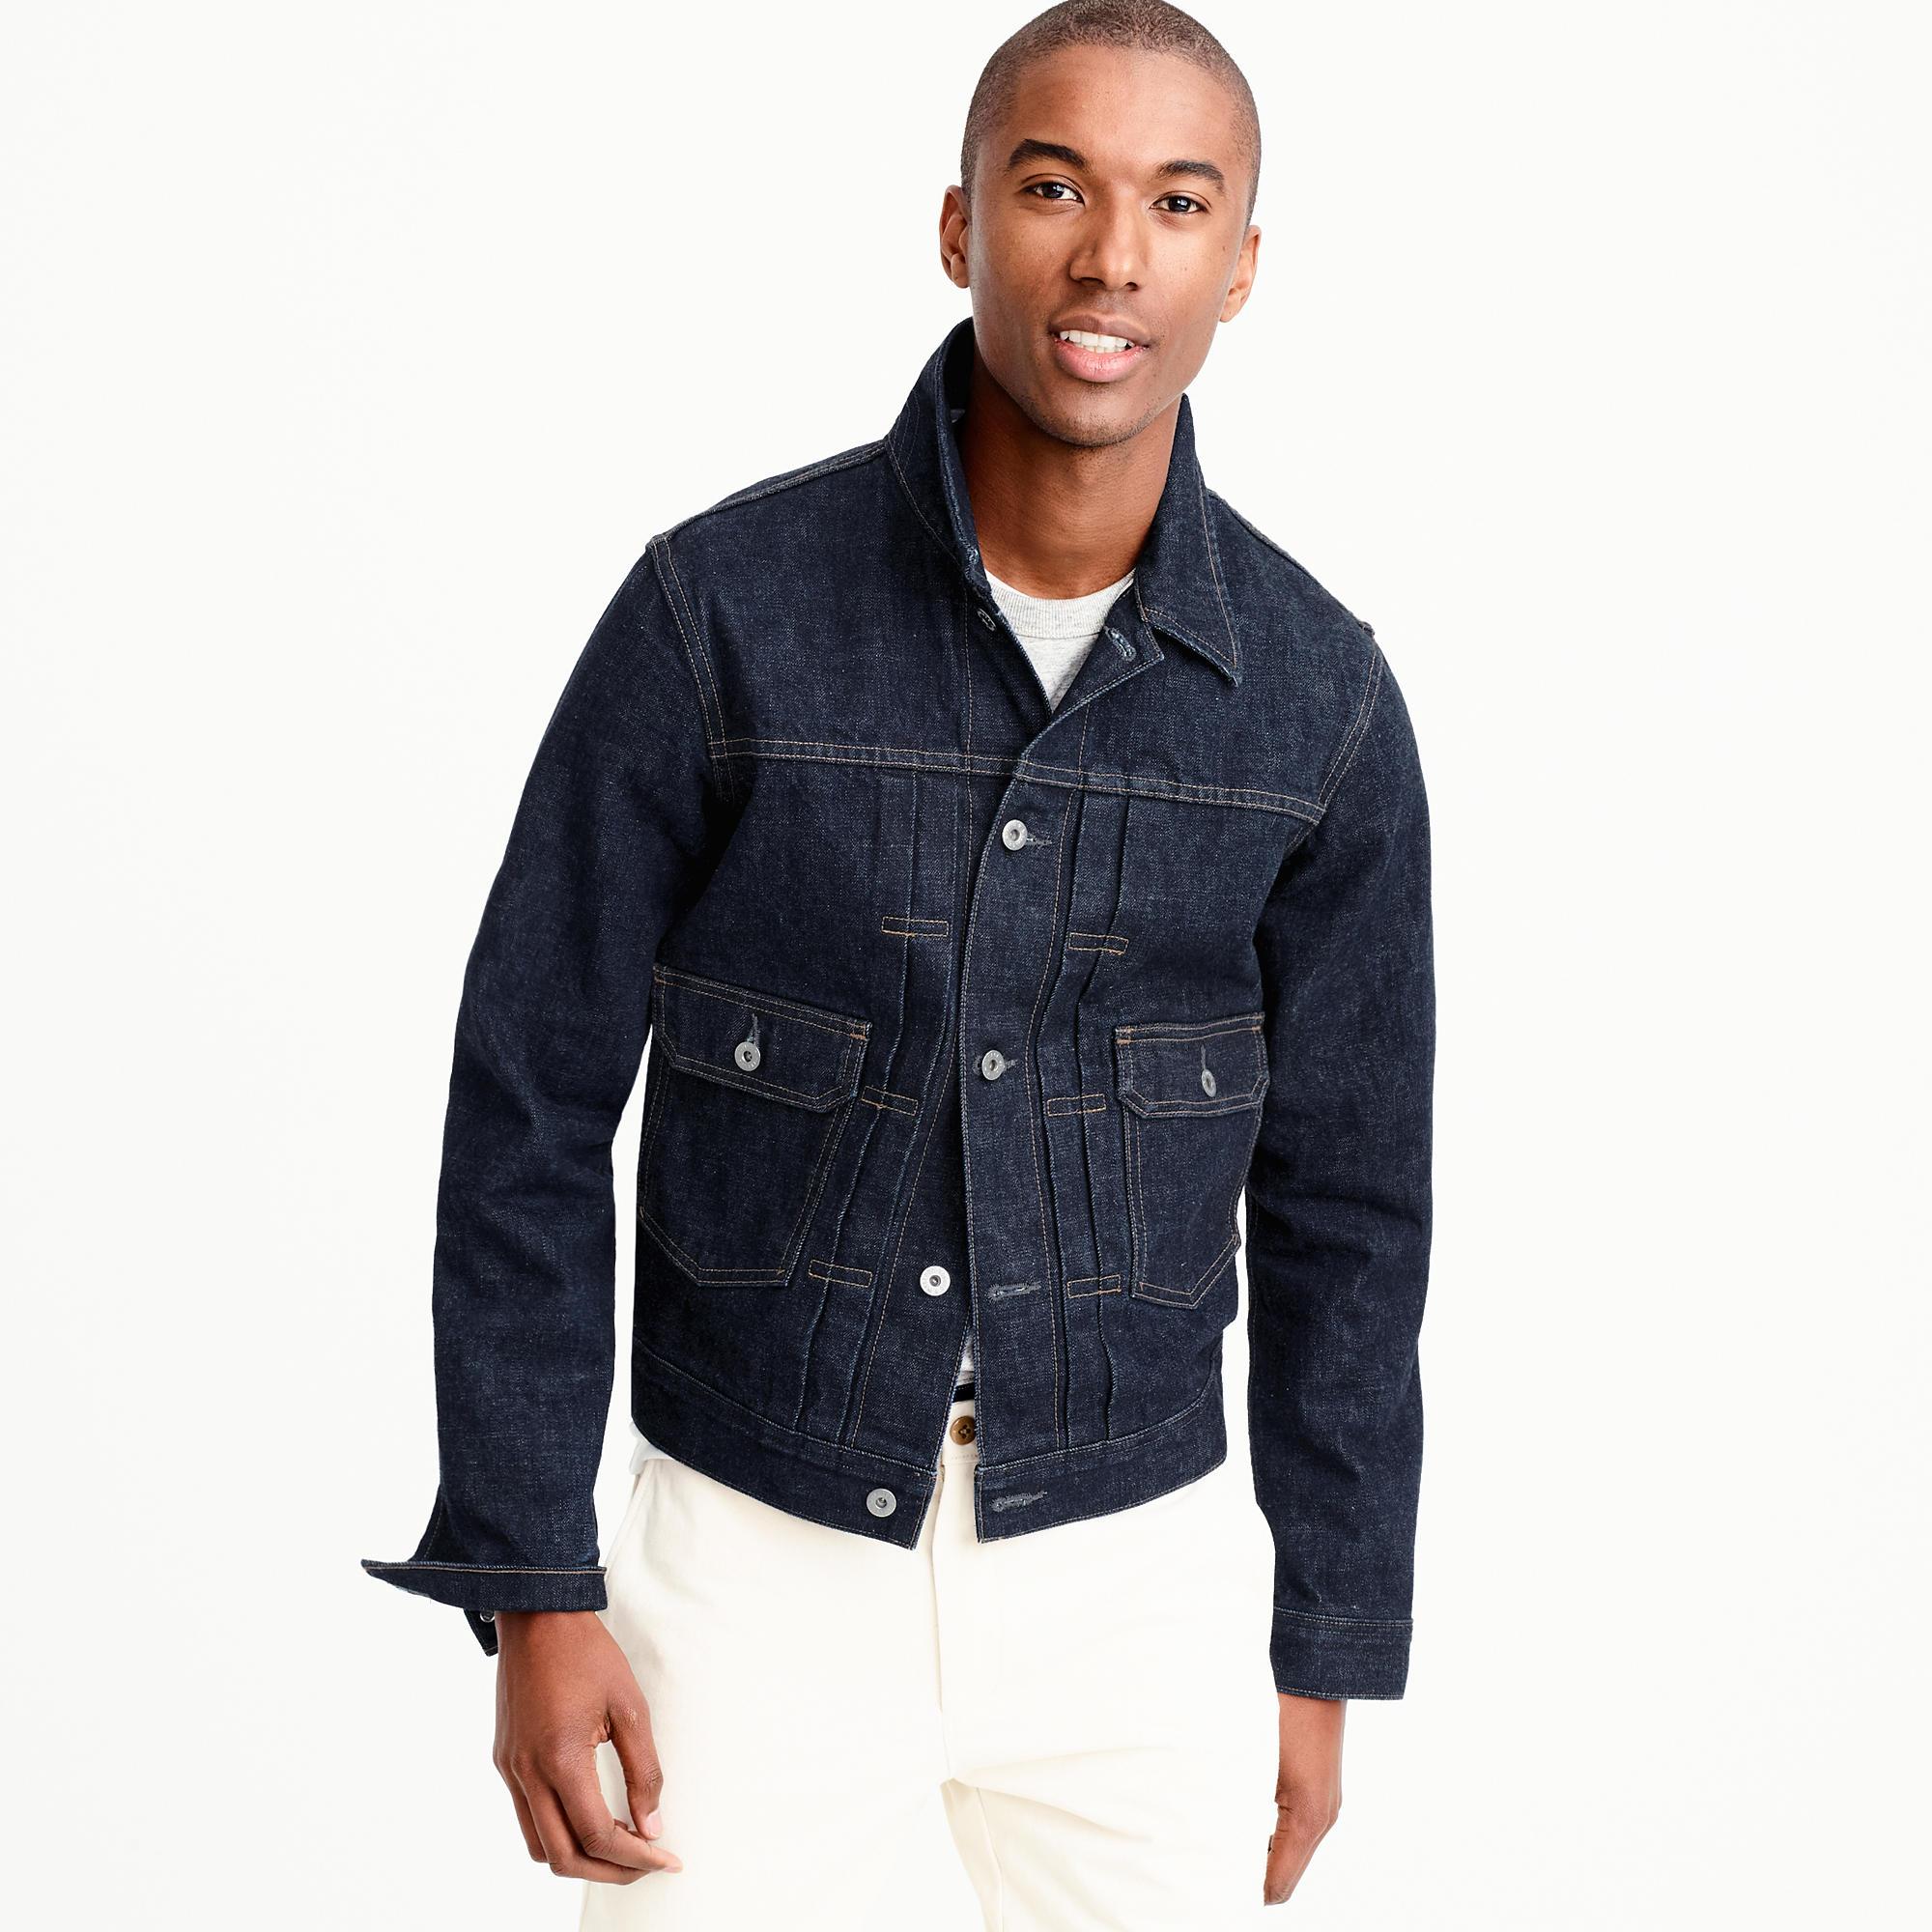 Mens jacket lazada - Cyber Men Winter Slim Fit Trench Coat Jacket Black Lazada Malaysia